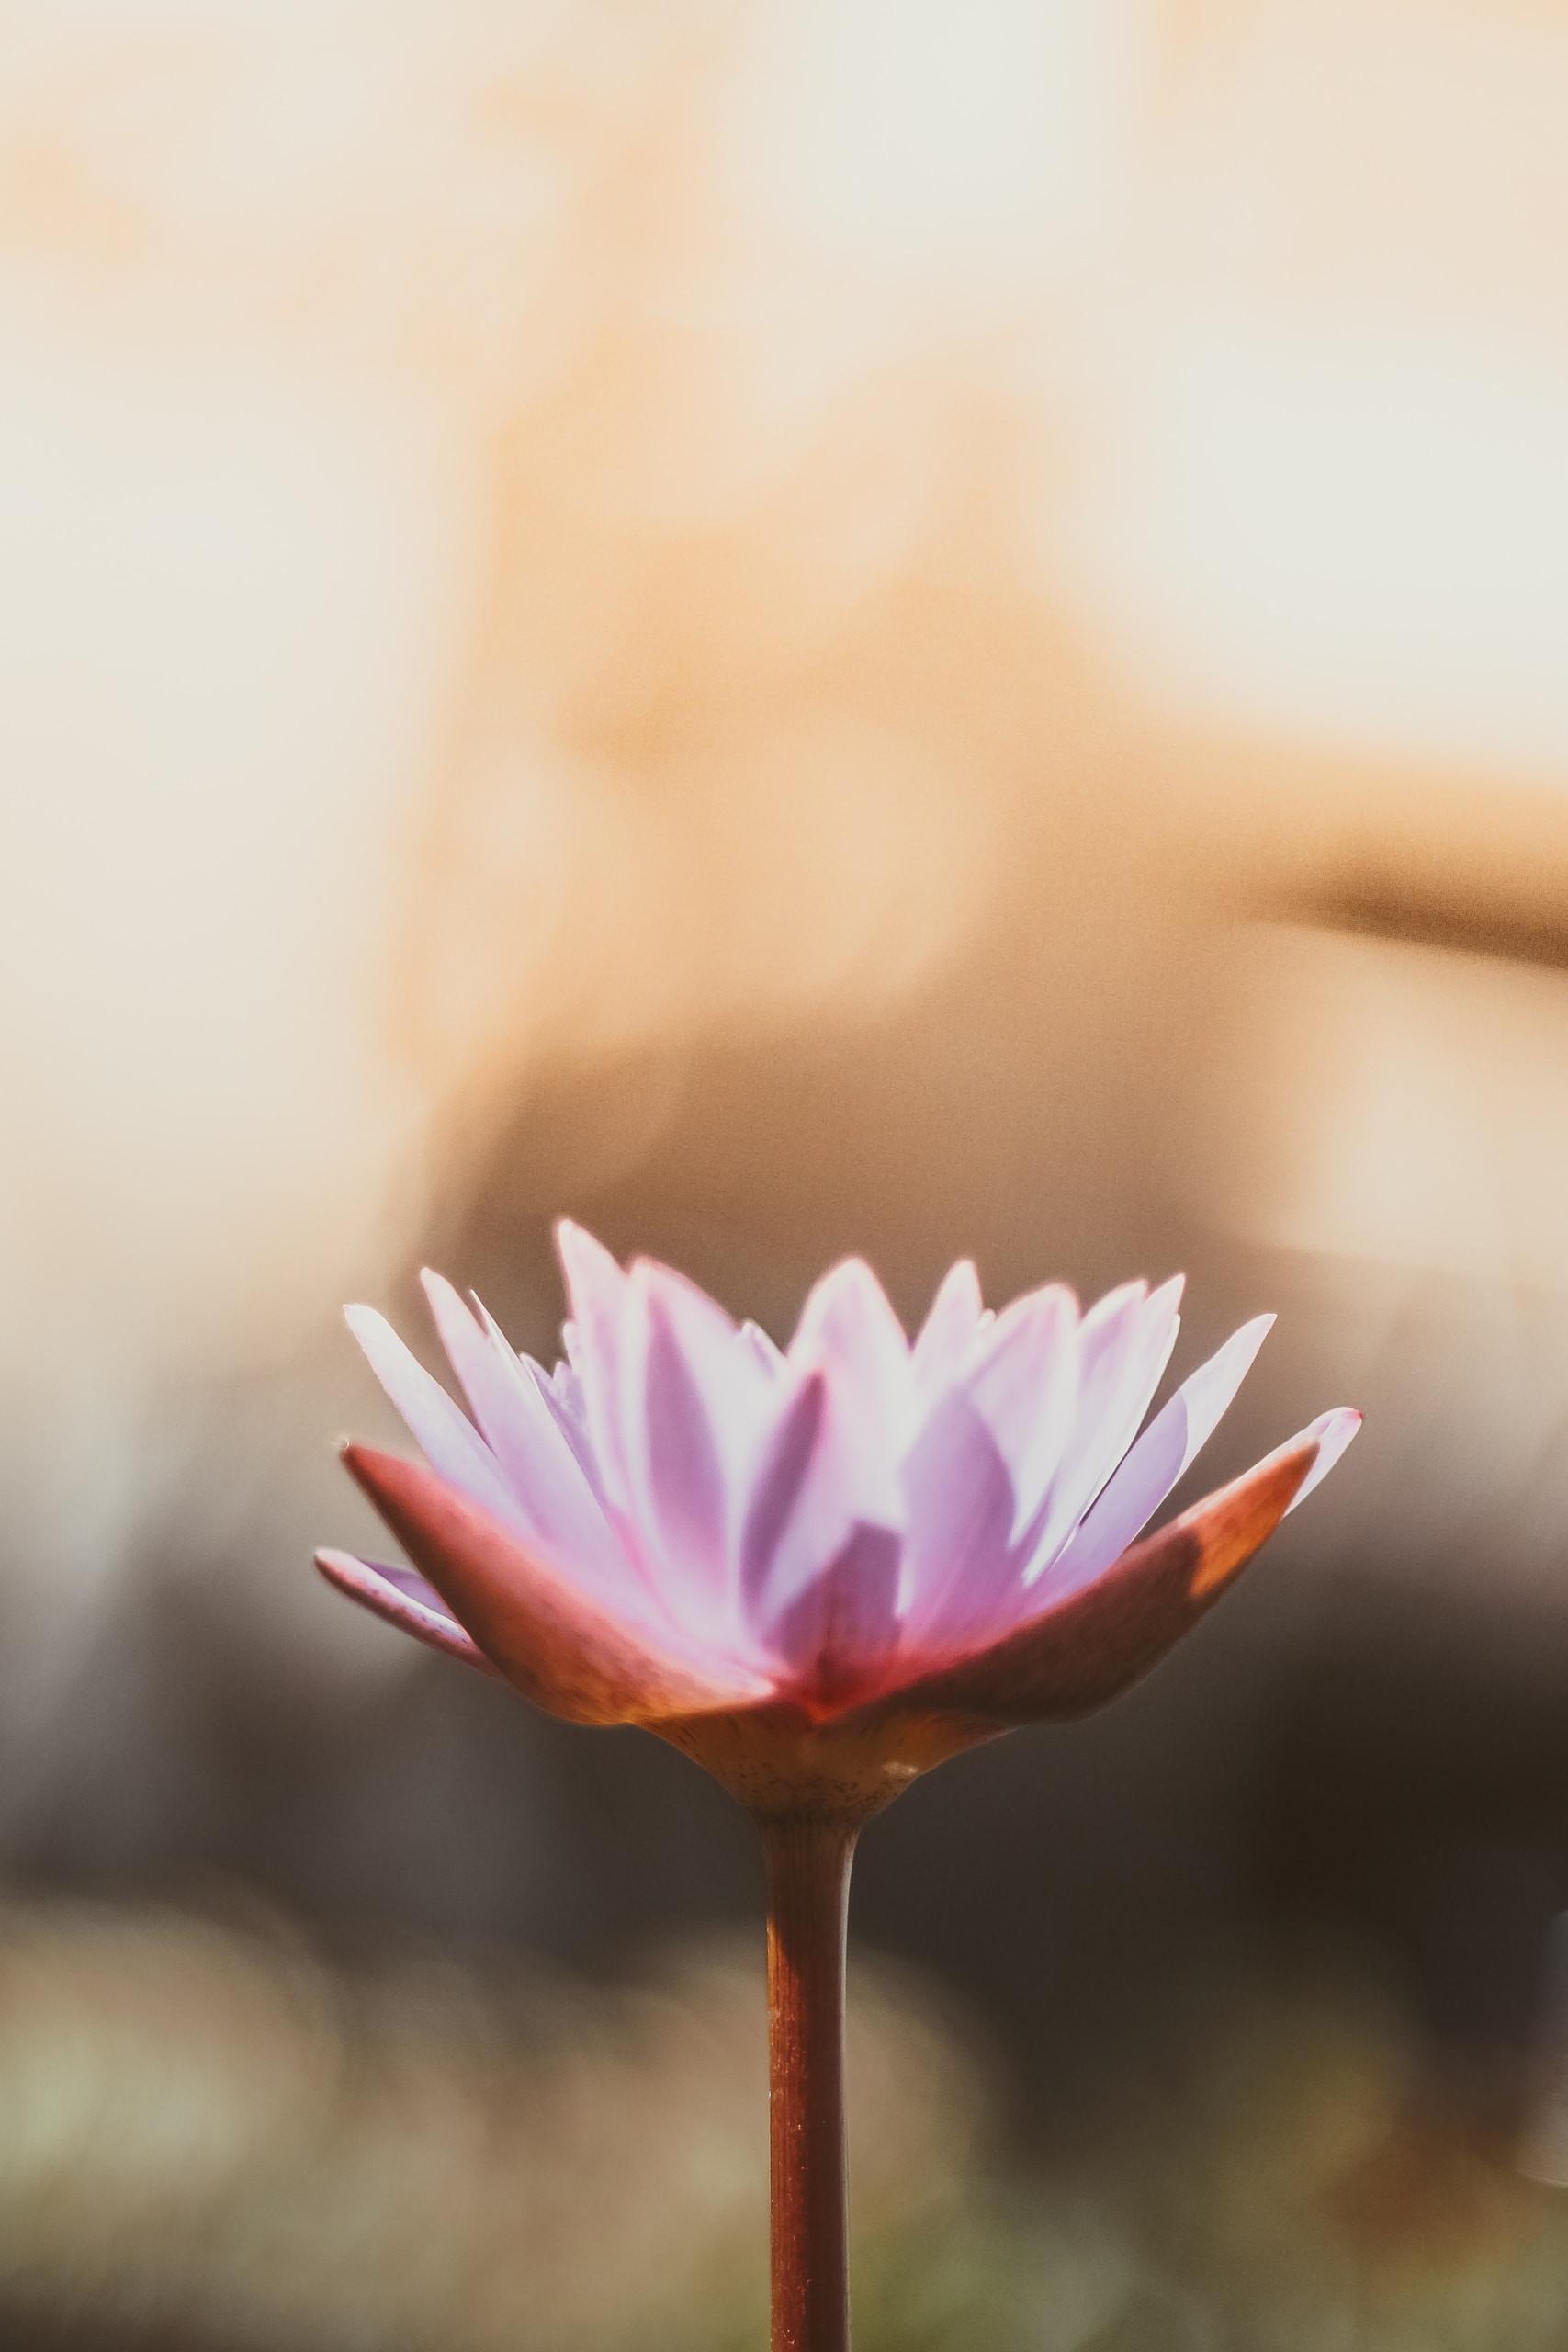 Restorative or Yin Yoga